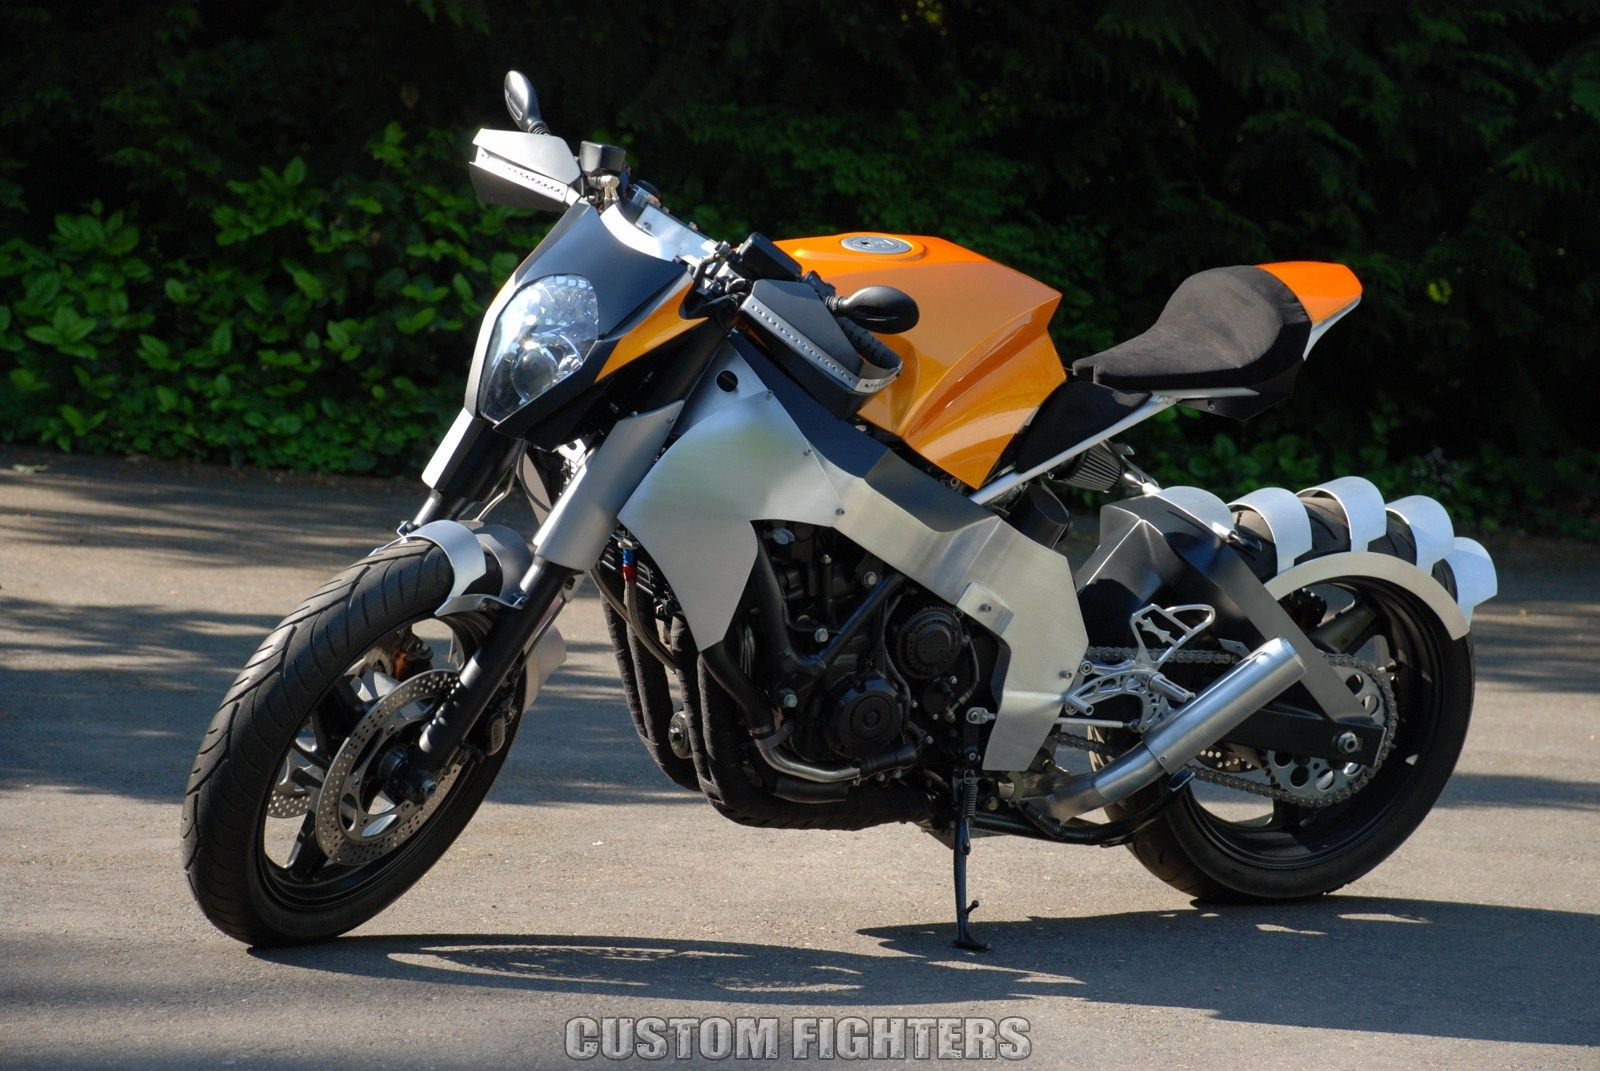 ian mcelroy's 1987 honda cbr 1000f custom streetbike streetfighter